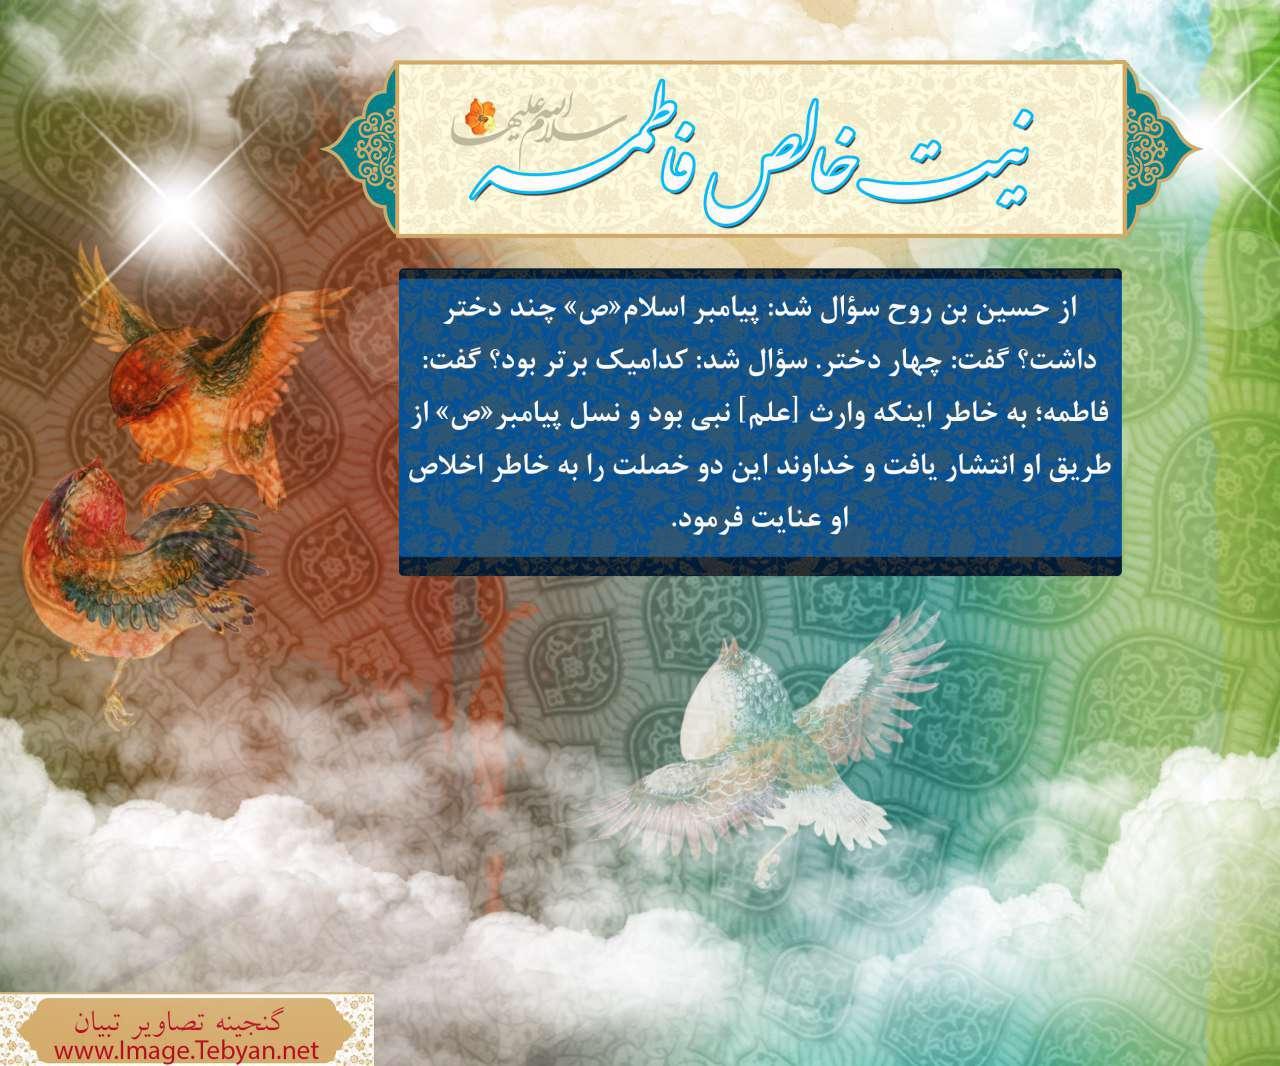 نیت خالص حضرت فاطمه سلام الله علیها